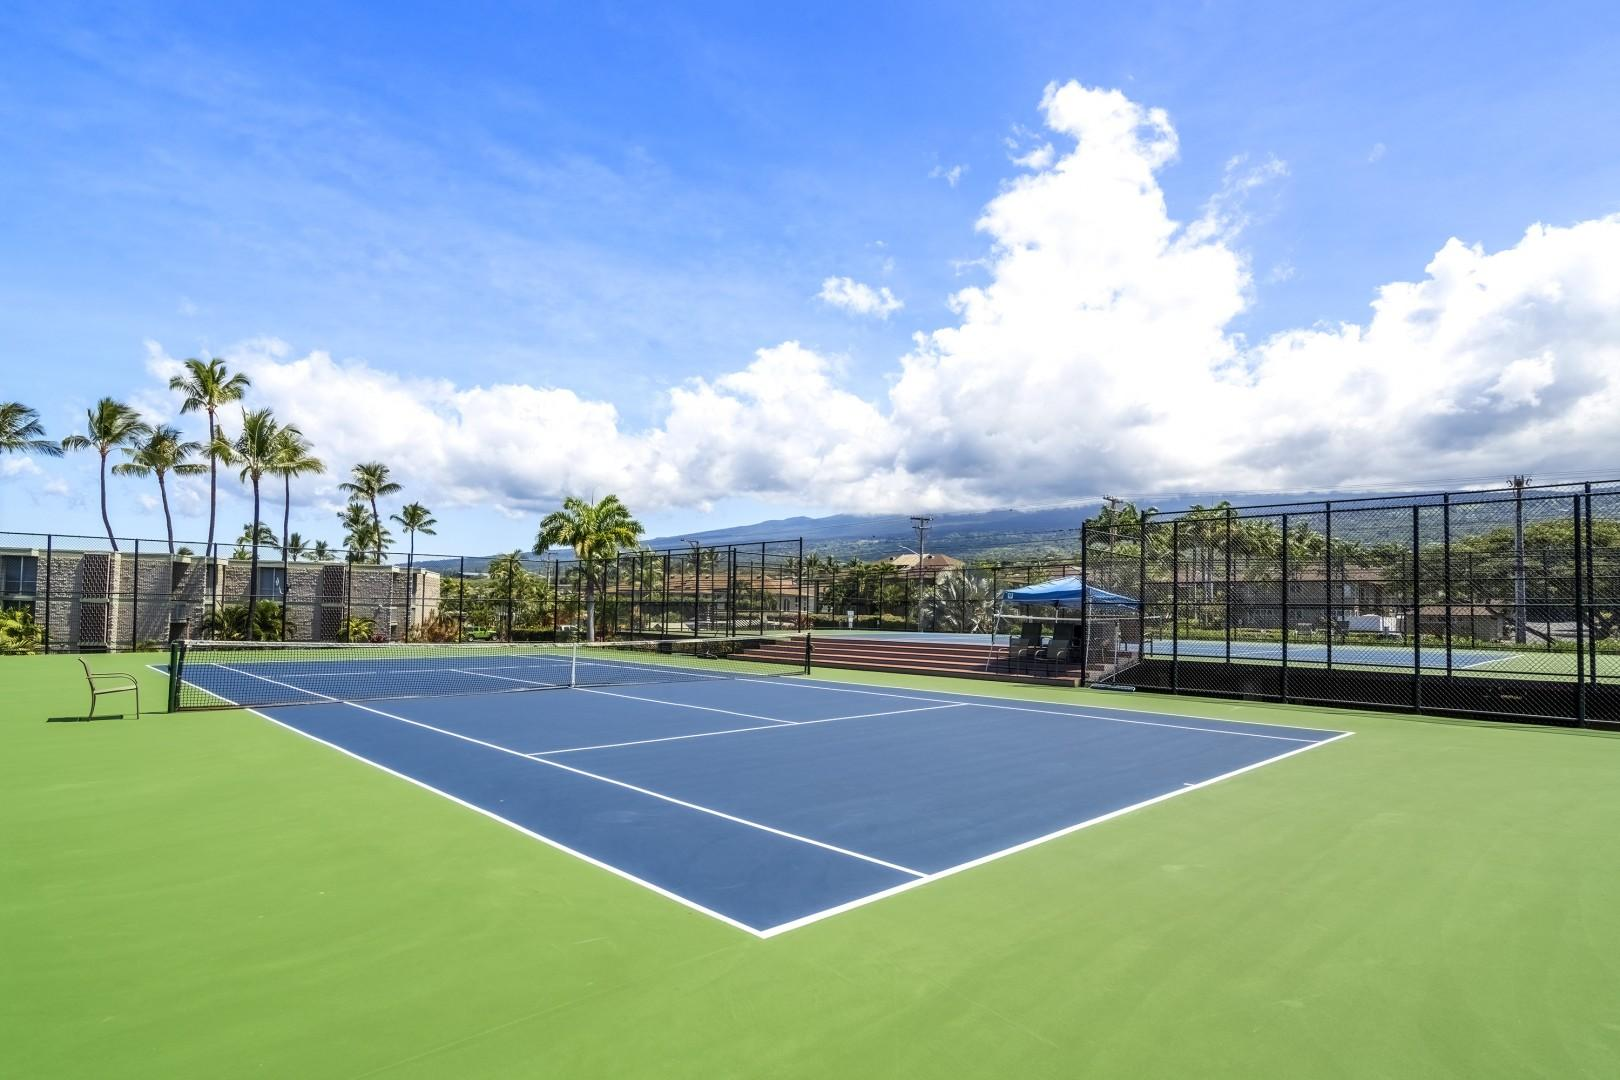 Kona Makai complex Tennis Courts